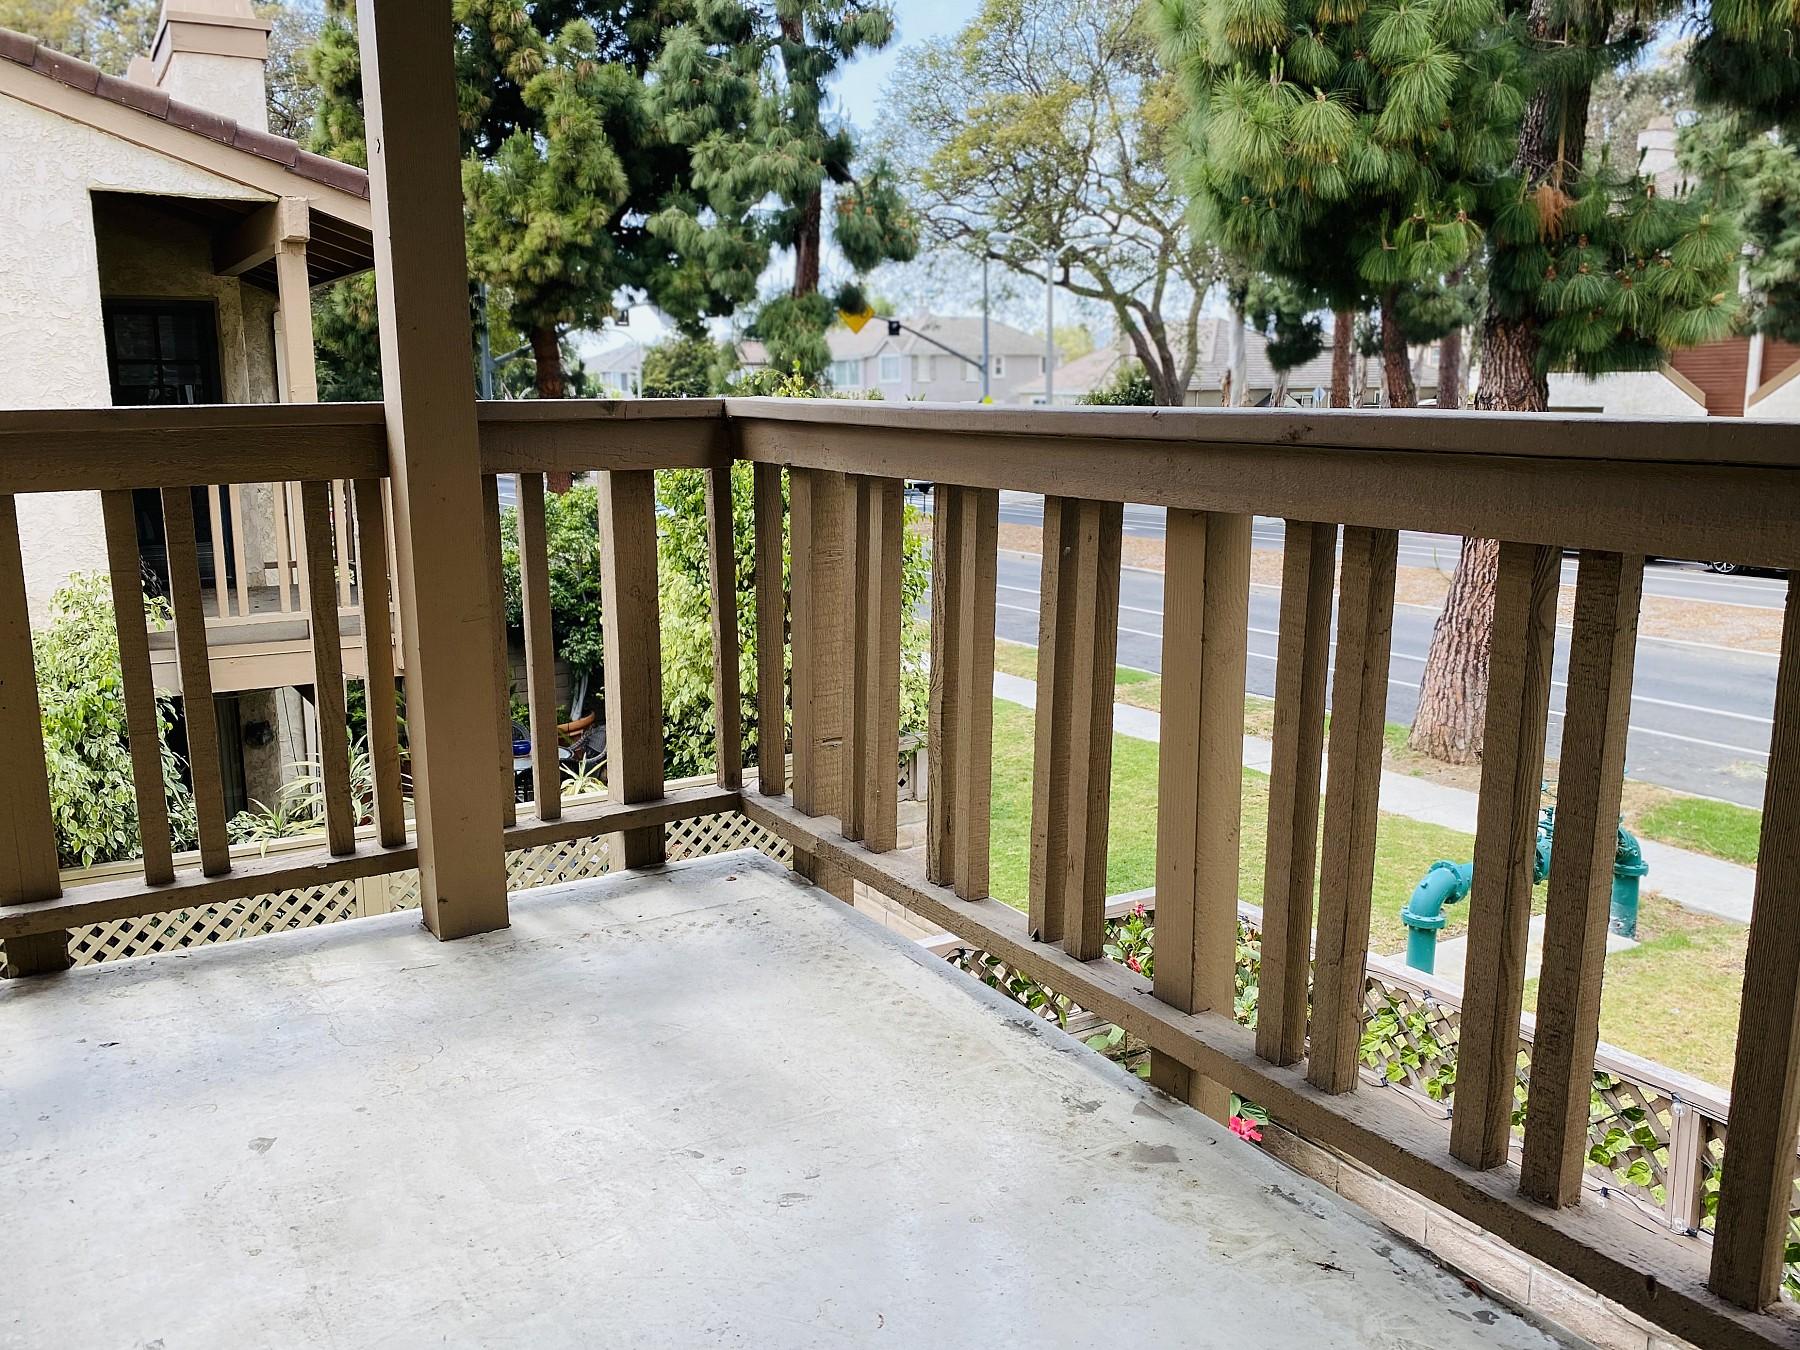 873 Miller Court, Ventura, CA 93003